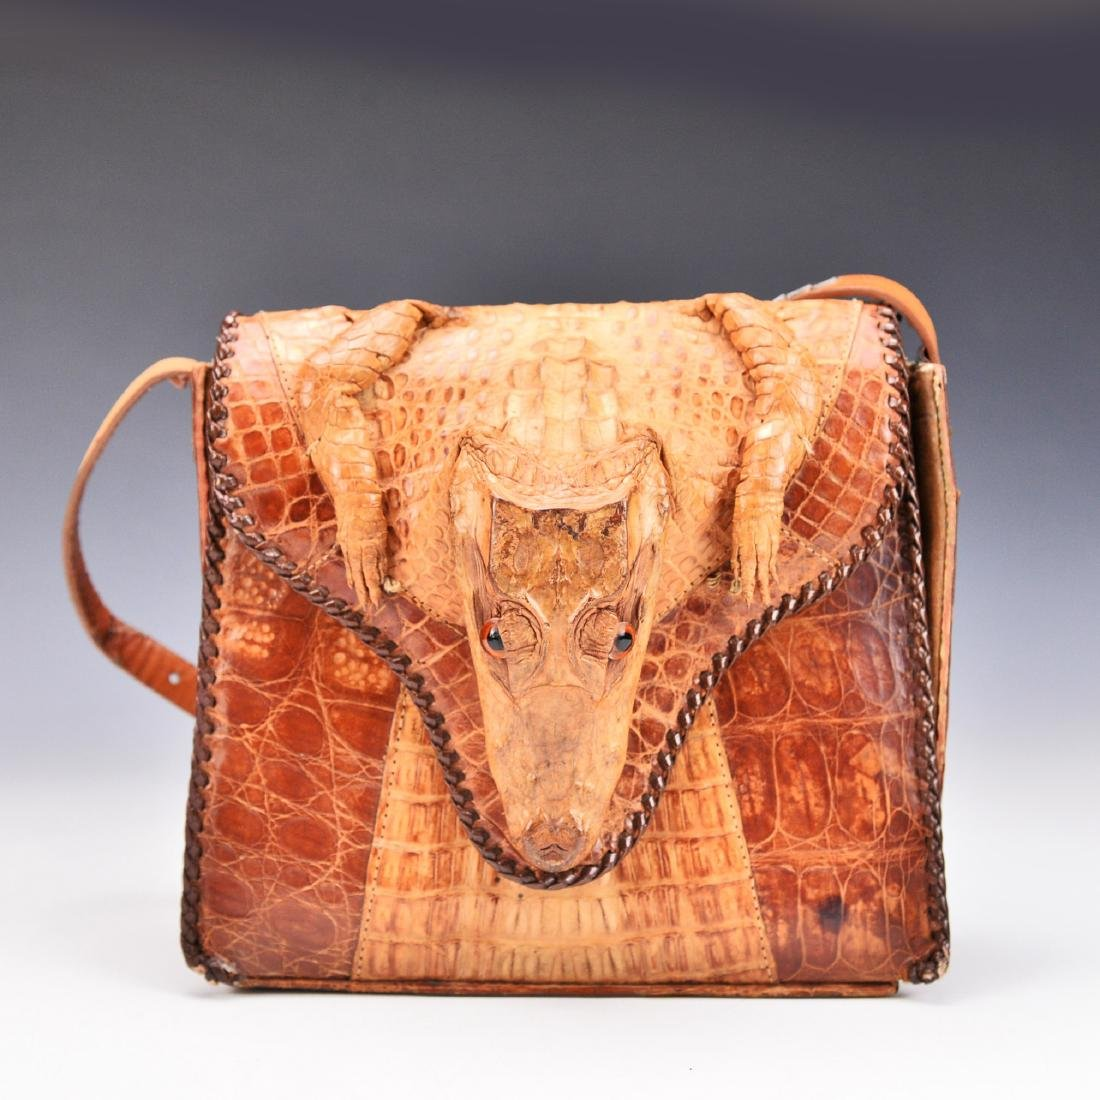 A Baby Crocodile Leather Bag